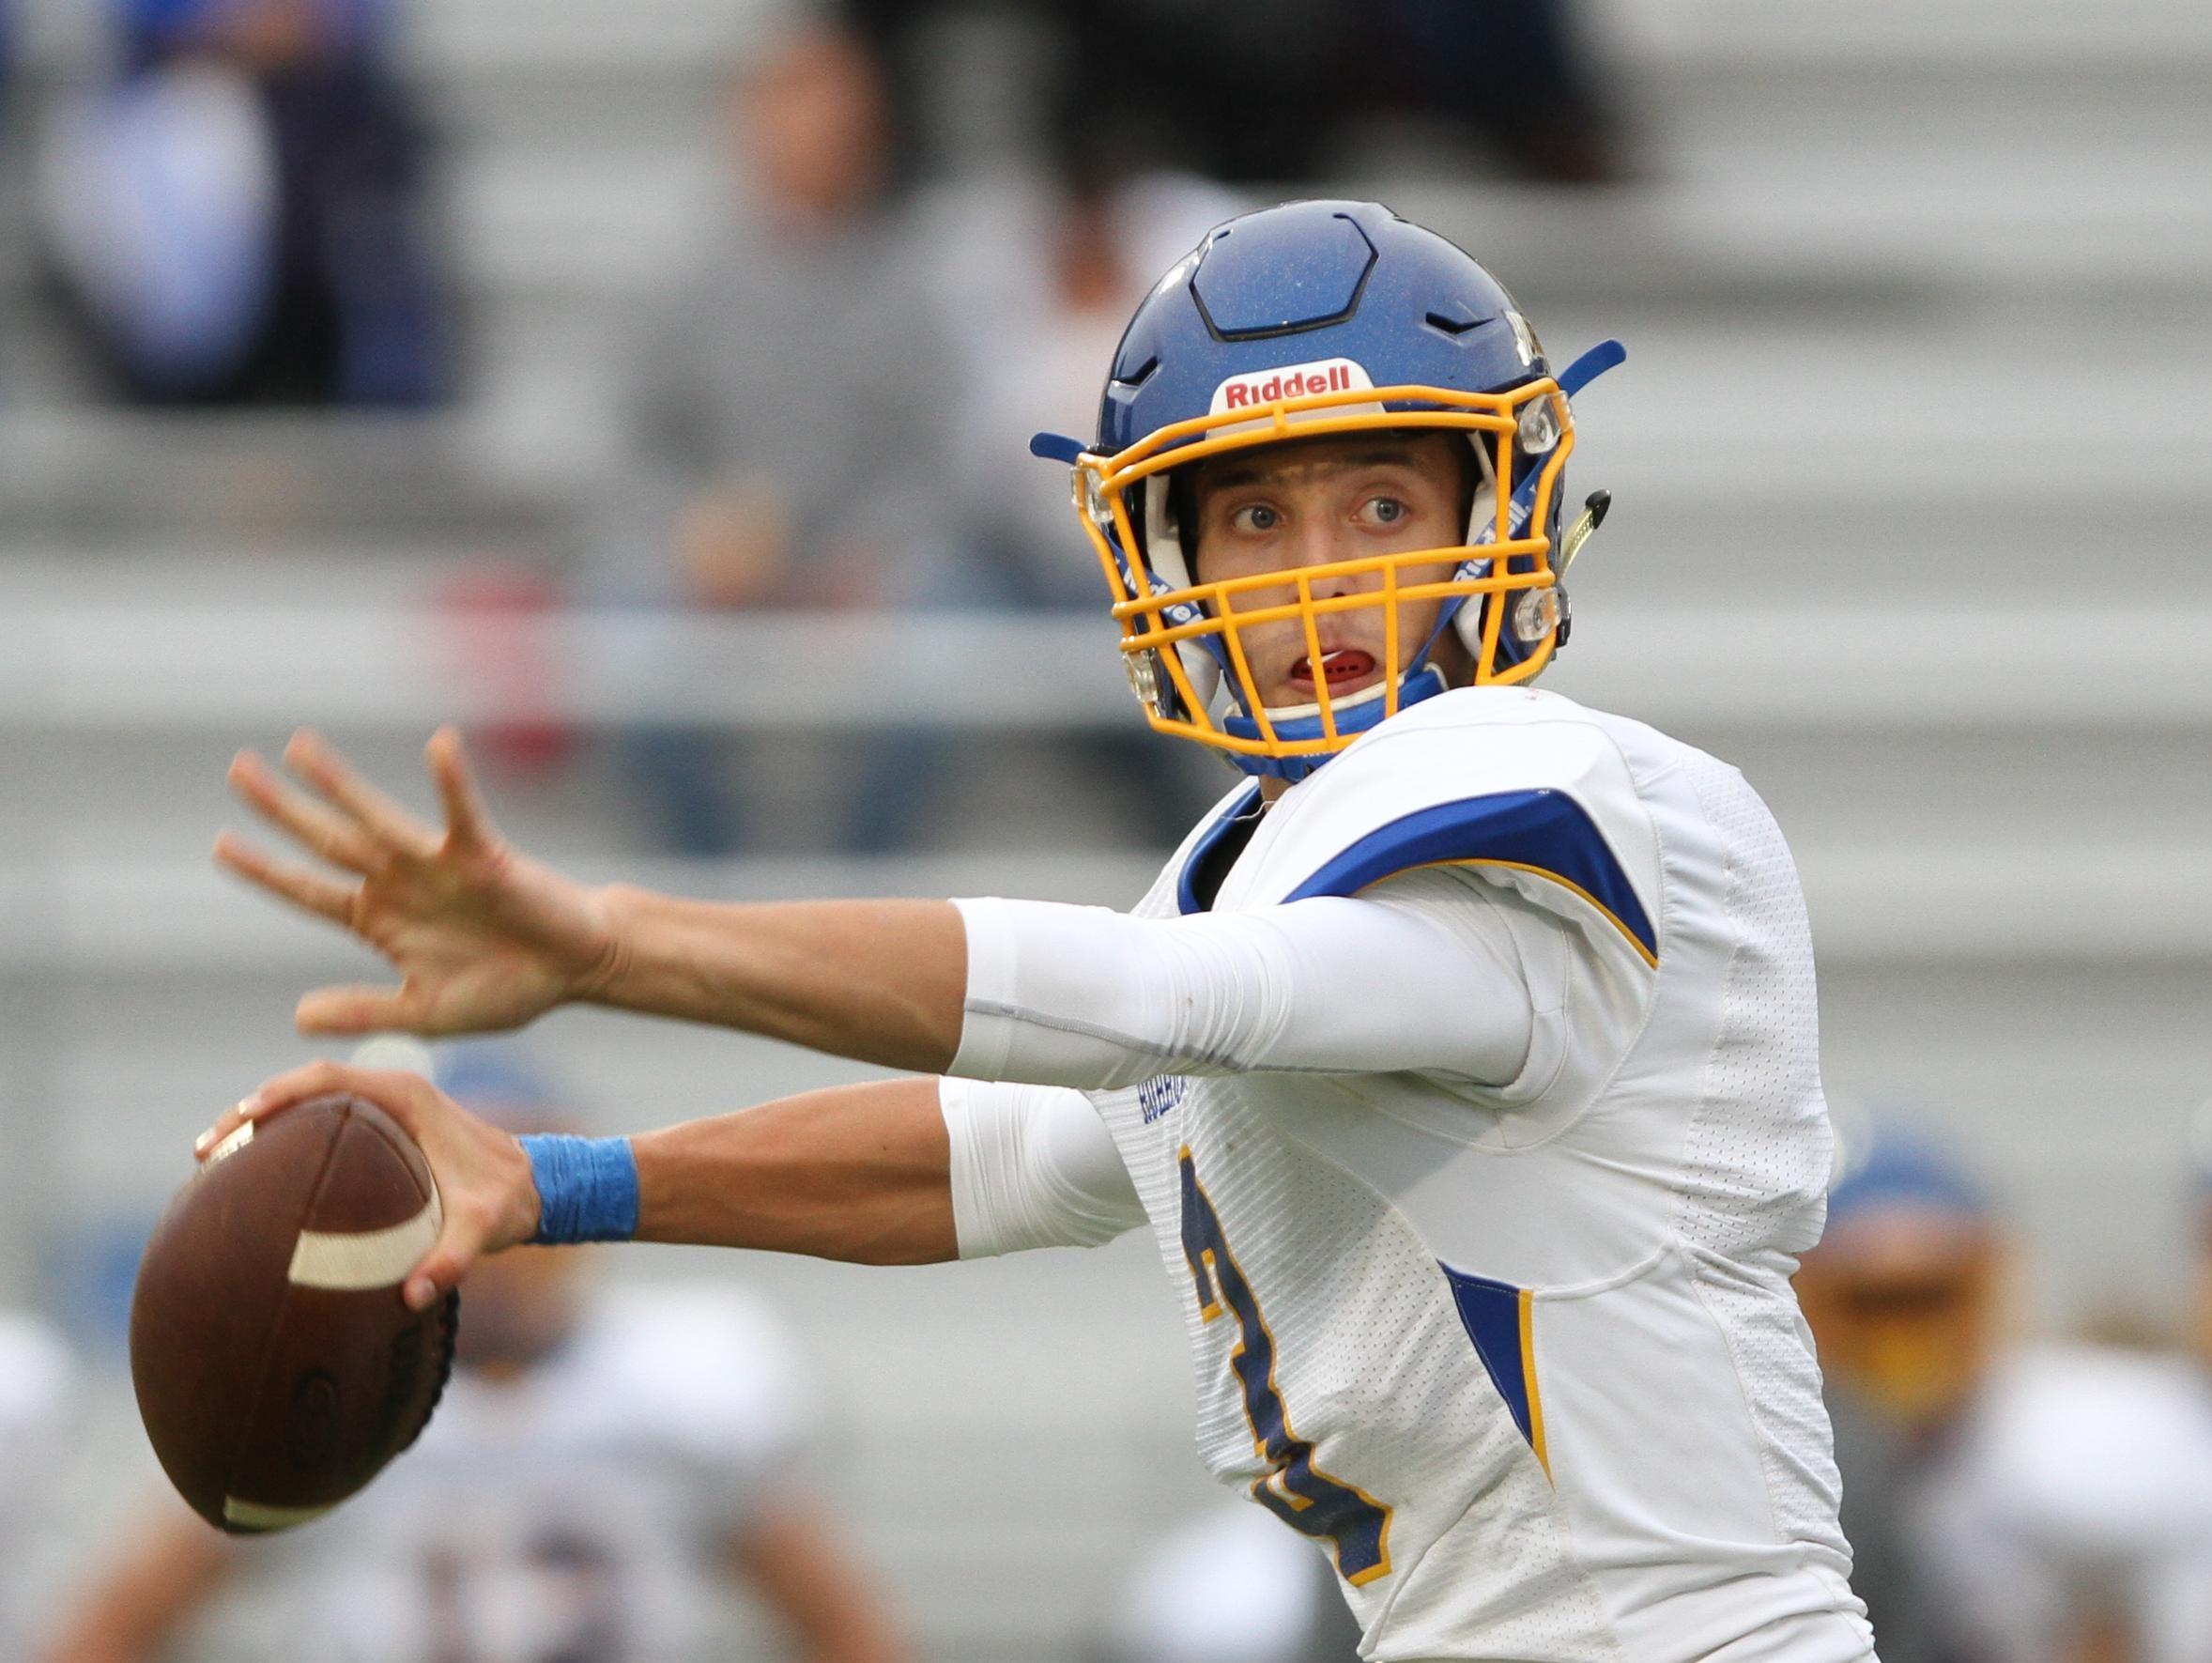 Wren quarterback Jay Urich (3) sets to pass against Daniel friday night at Daniel High School, October 2, 2015.